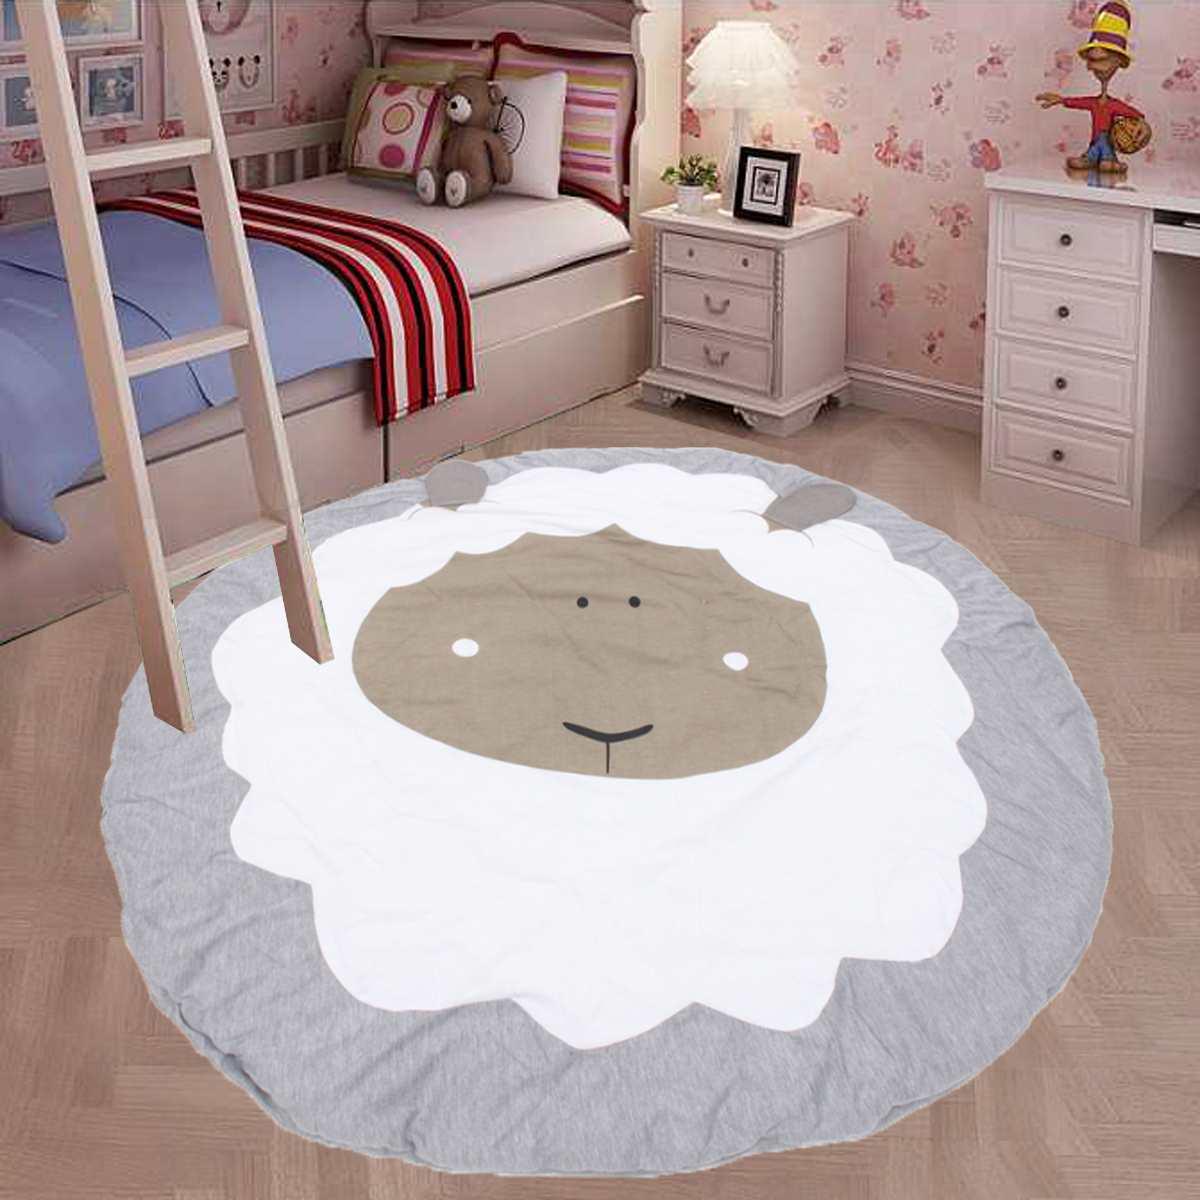 Play Mat Round Carpet Game Cartoon Pure Cotton Crawling Mat For Children Sheep Mat Blanket Carpet Children's Room Decorations